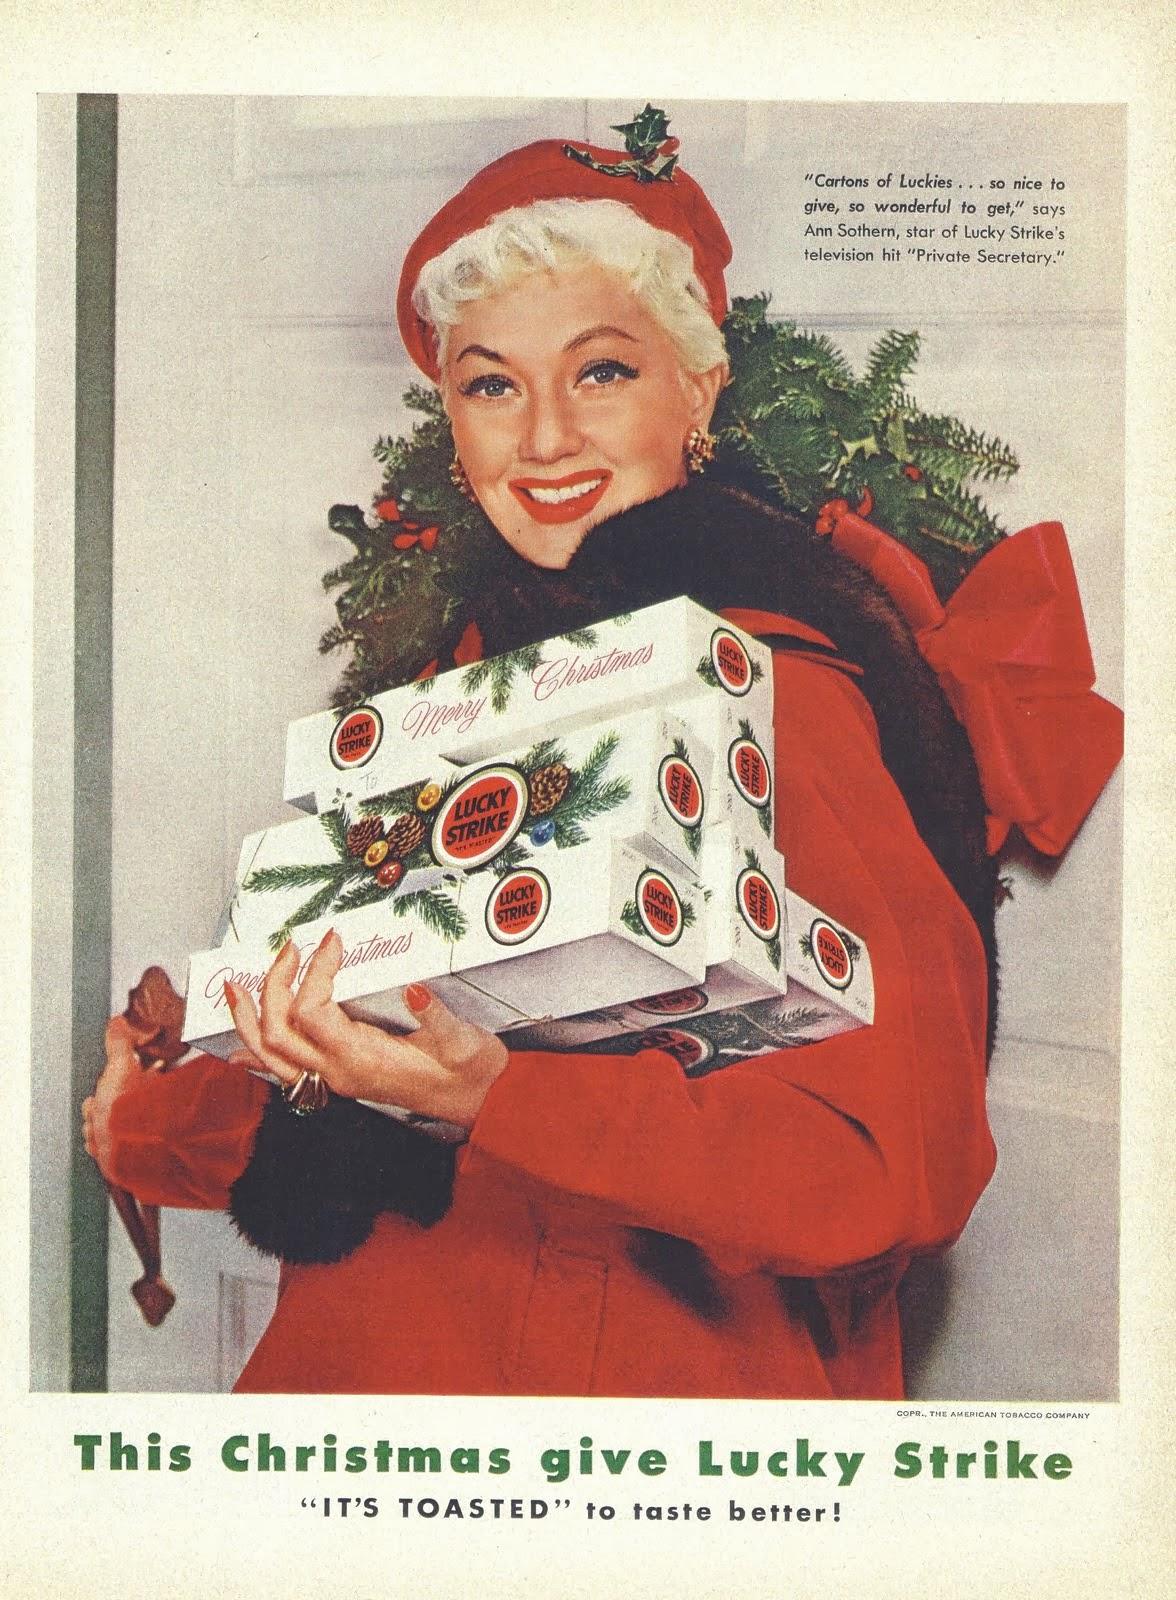 24 VINTAGE CHRISTMAS CIGARETTE ADS Popthomology